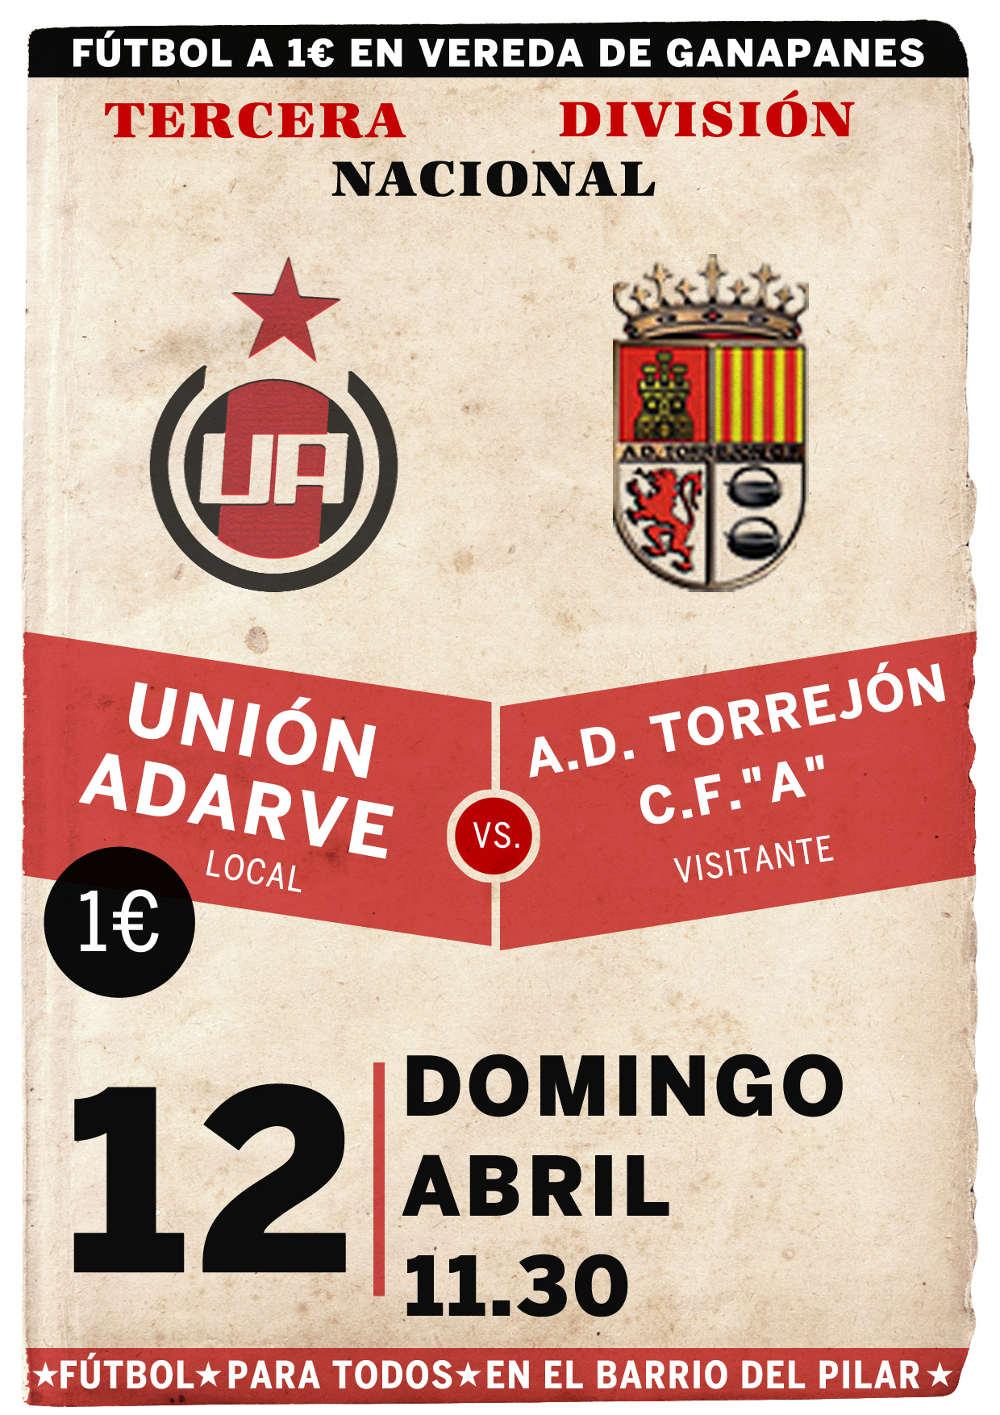 Unión Adarve vs A.D. Torrejón